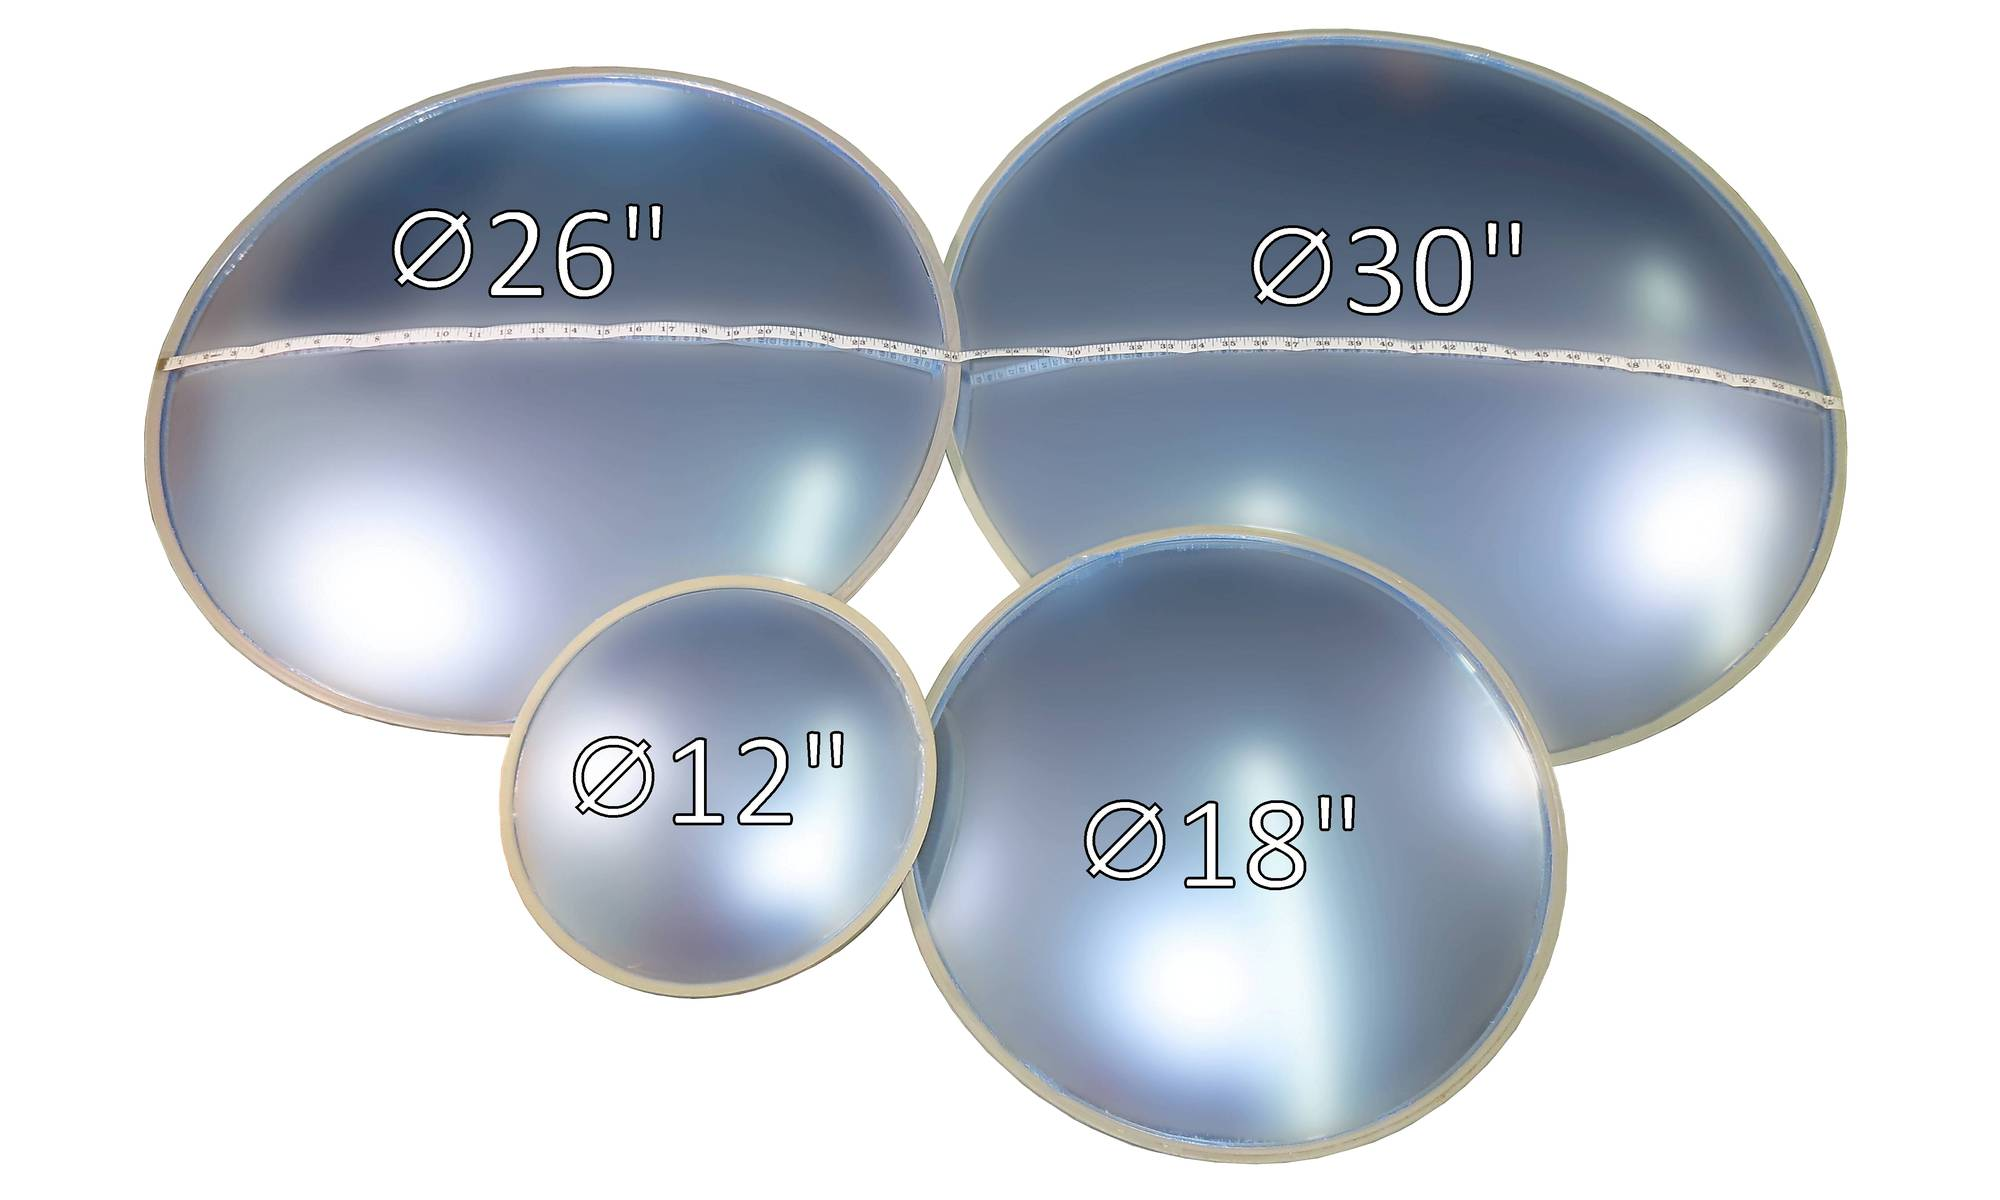 Convex mirror presentation 100 degrees, M64.